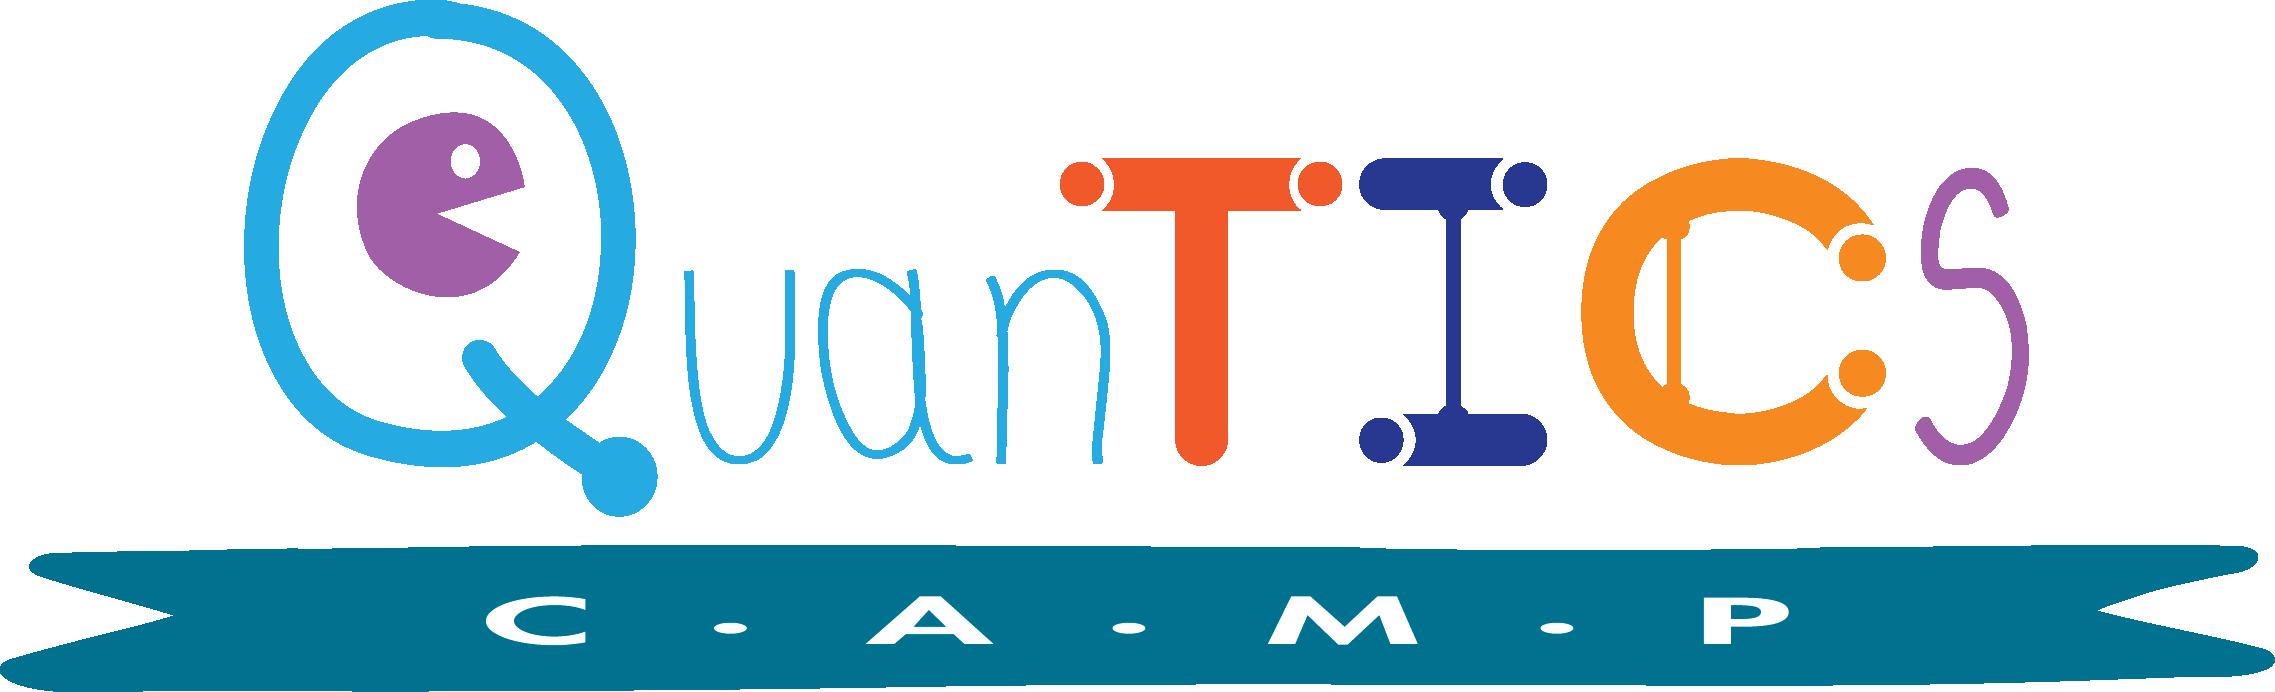 QUANTICScamp Activa - Campamento Tecnológico